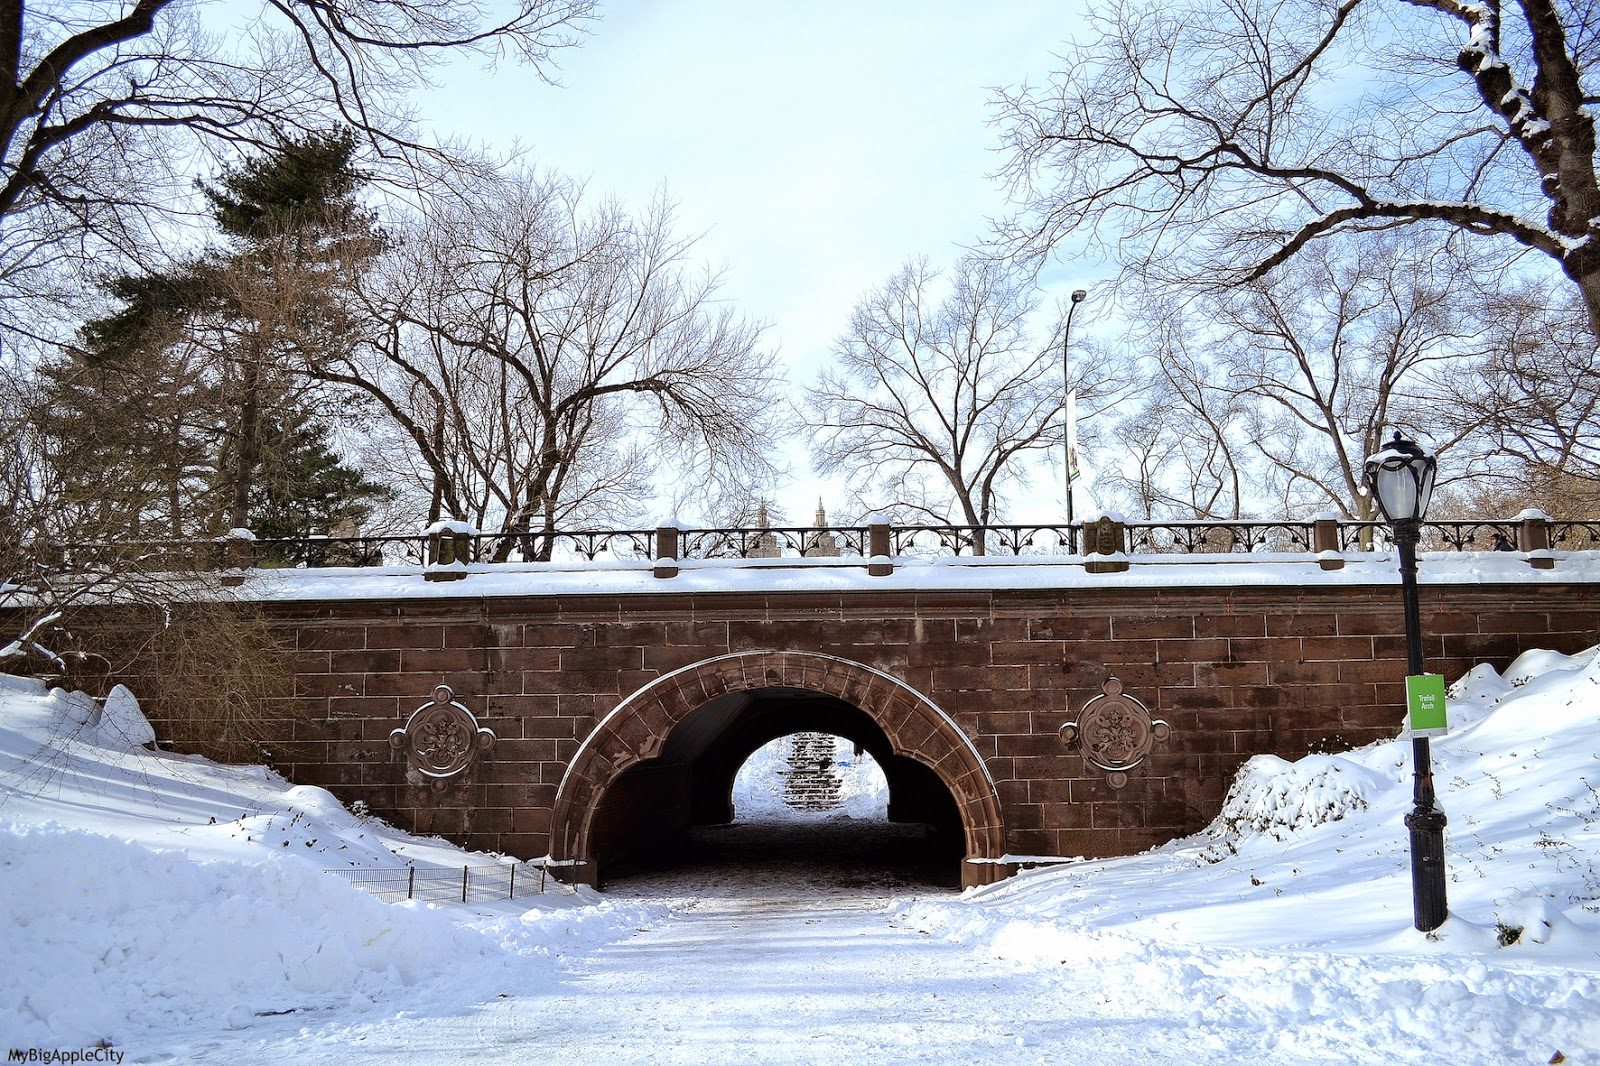 juno-2015-NYC-Blizzard-Central-park-snow